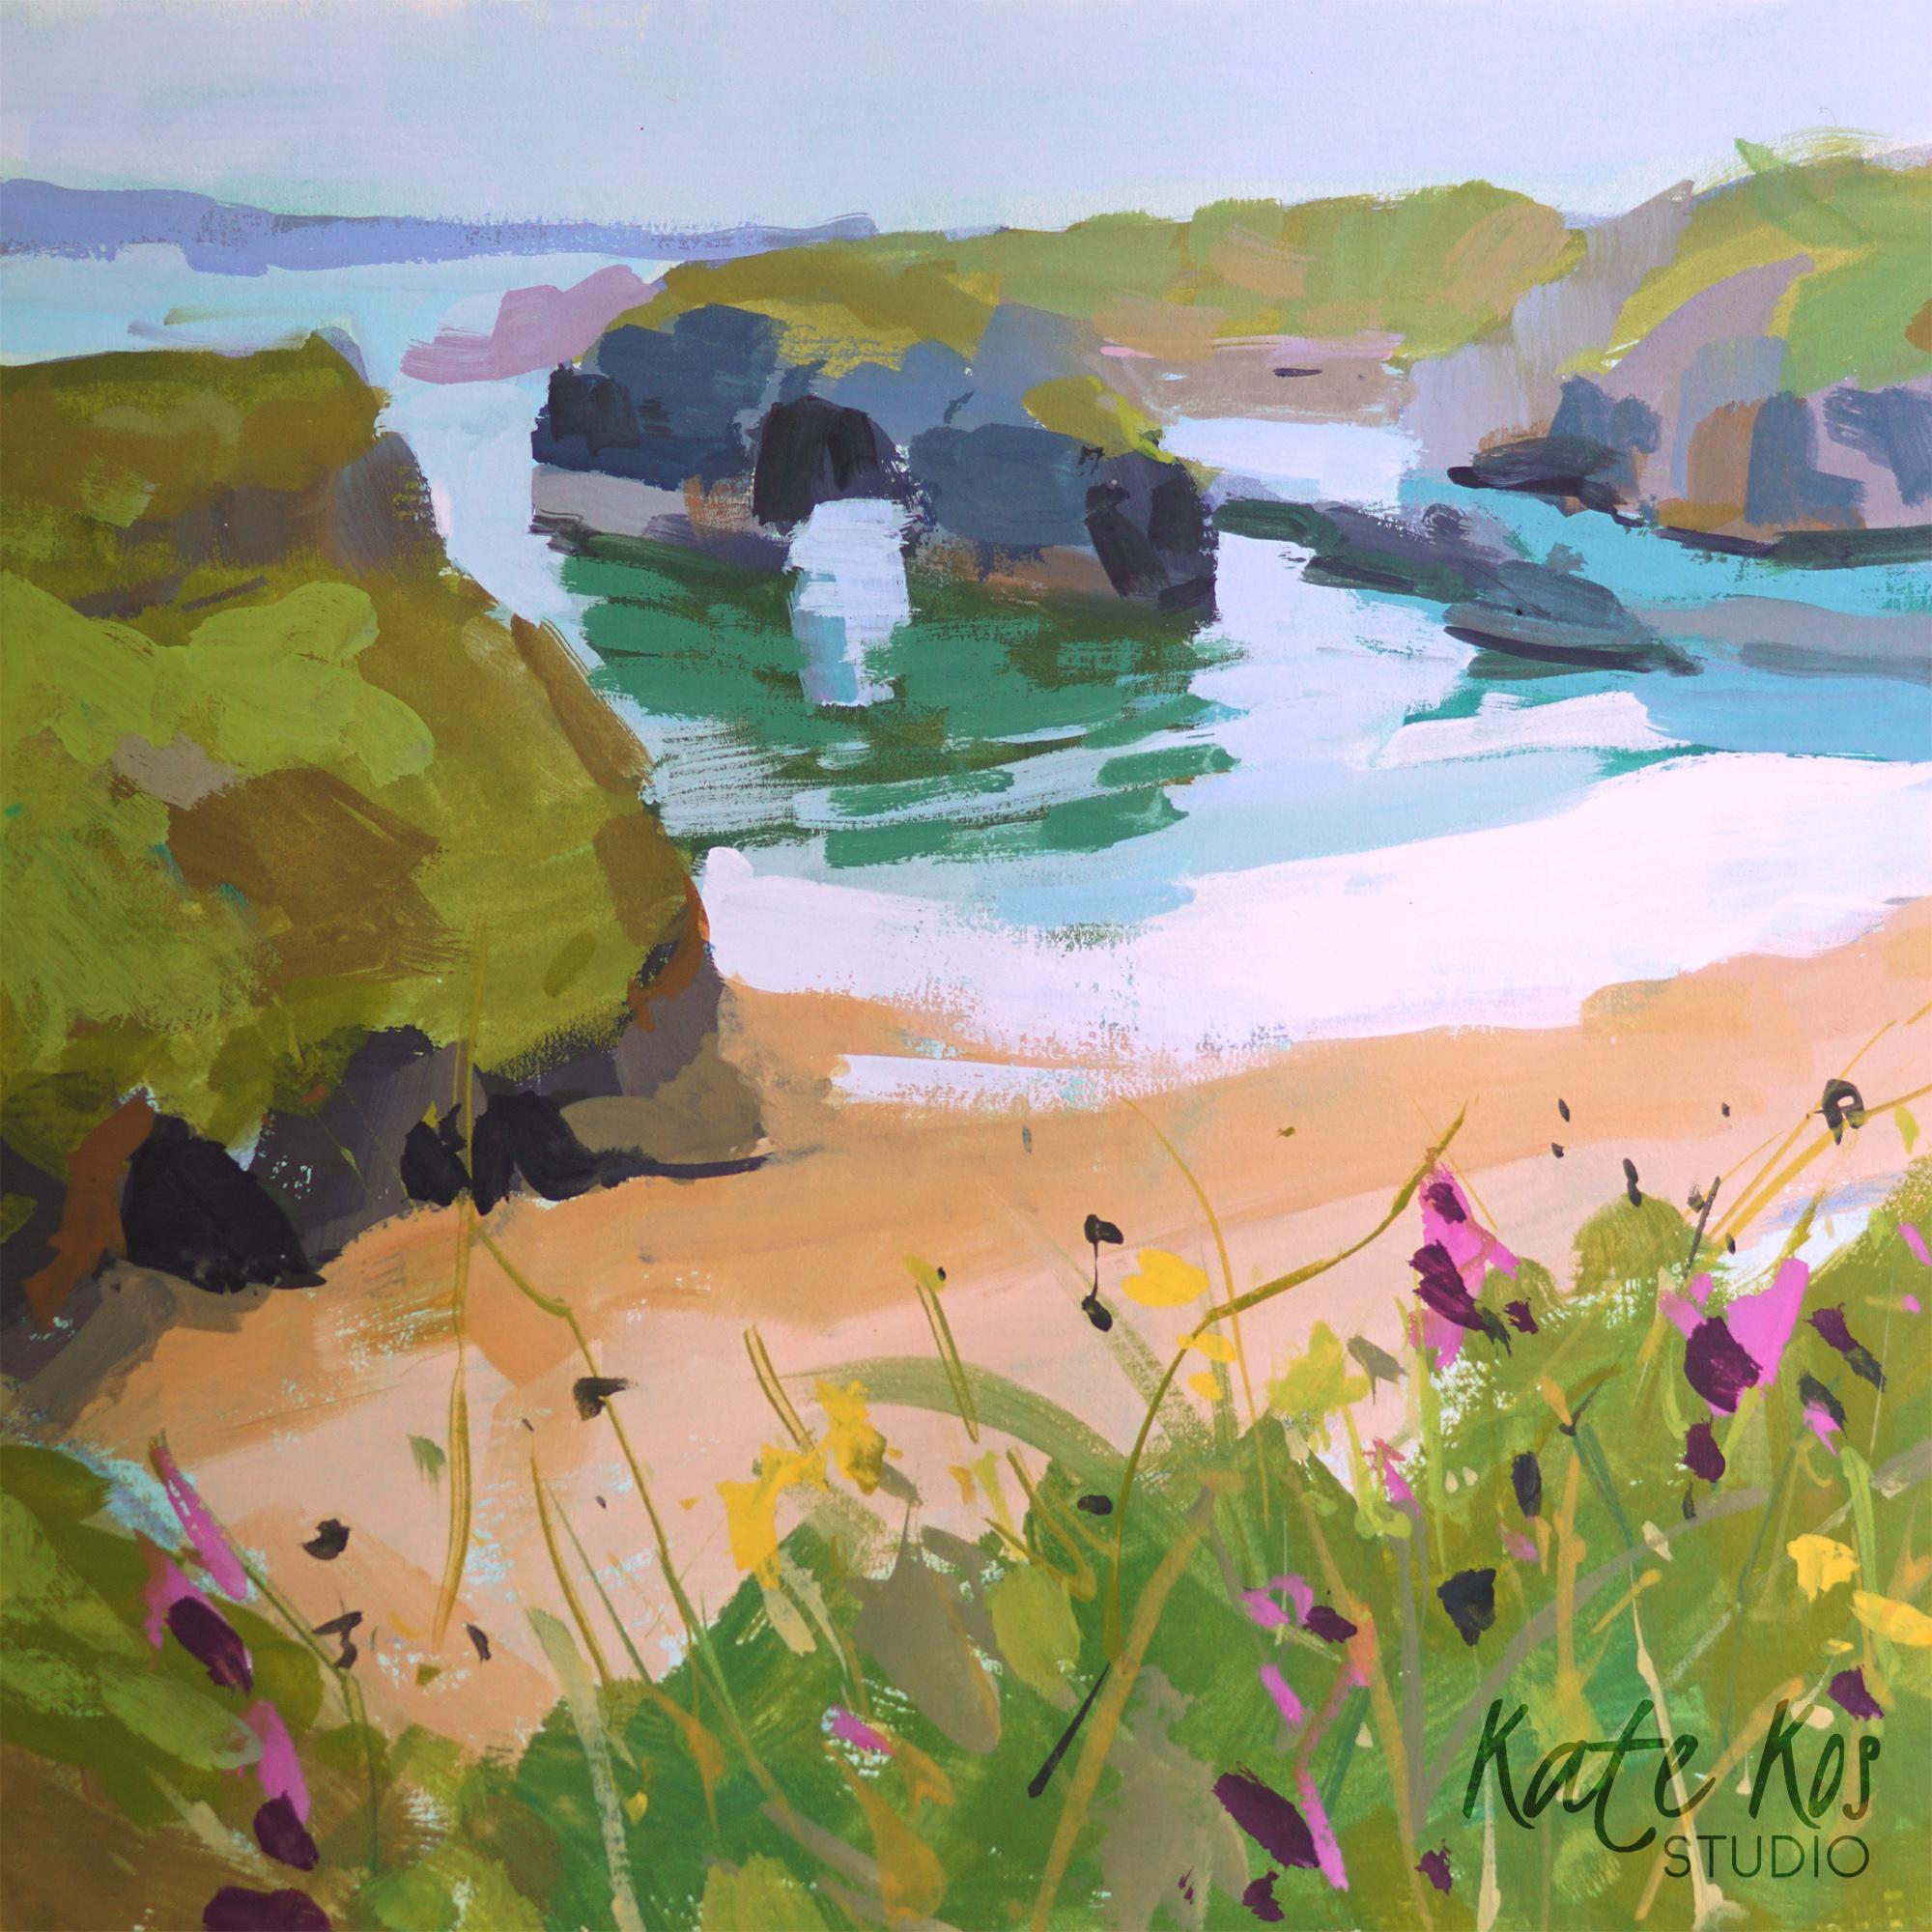 2021 art painting gouache seascape Ballybunion by Kate Kos - Square Away 3